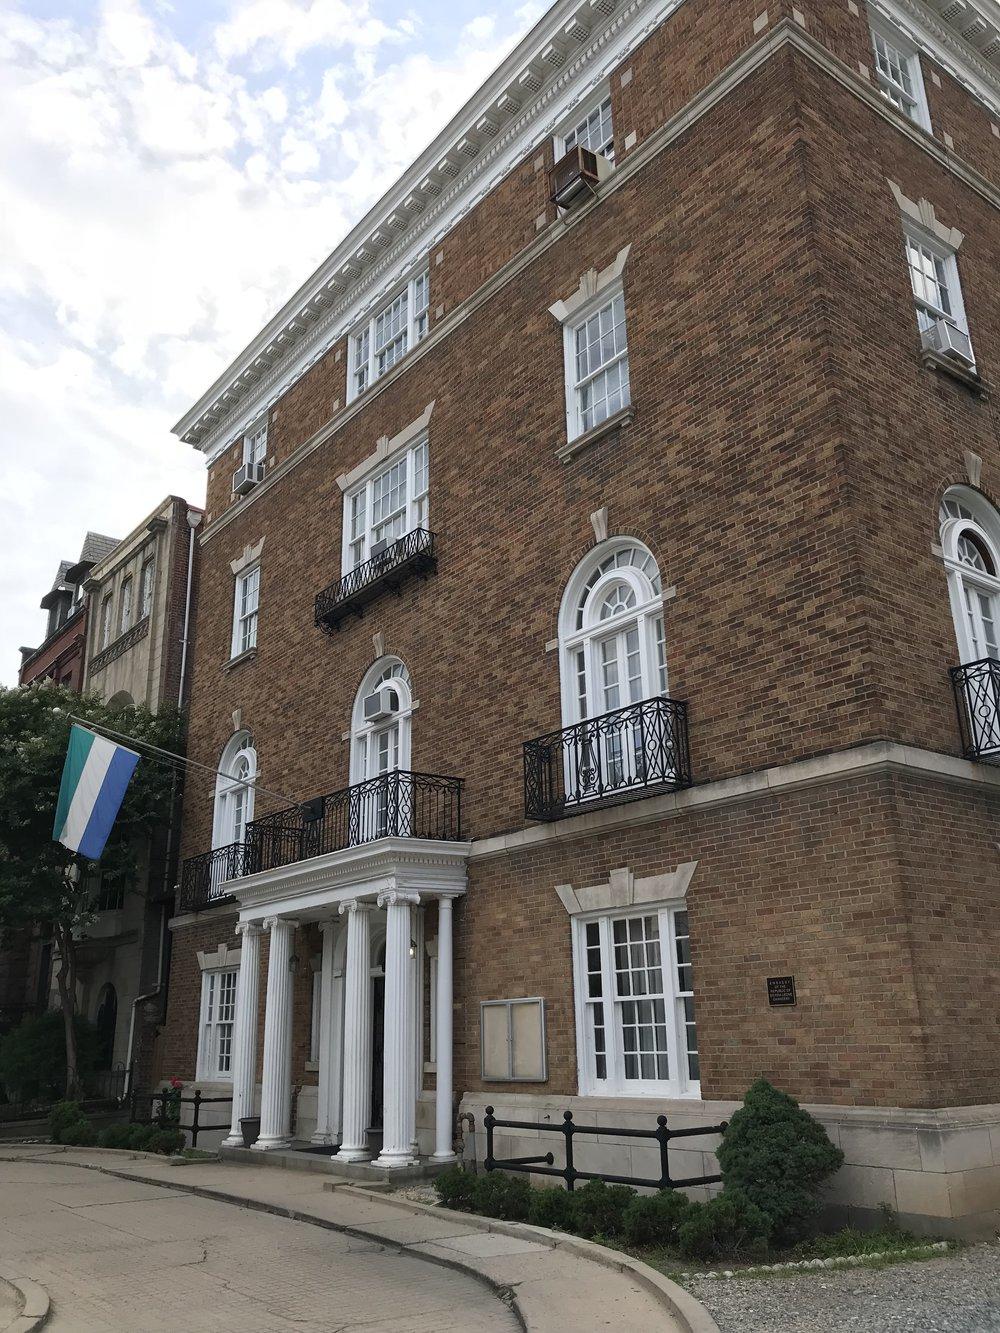 The Embassy of Sierra Leone.